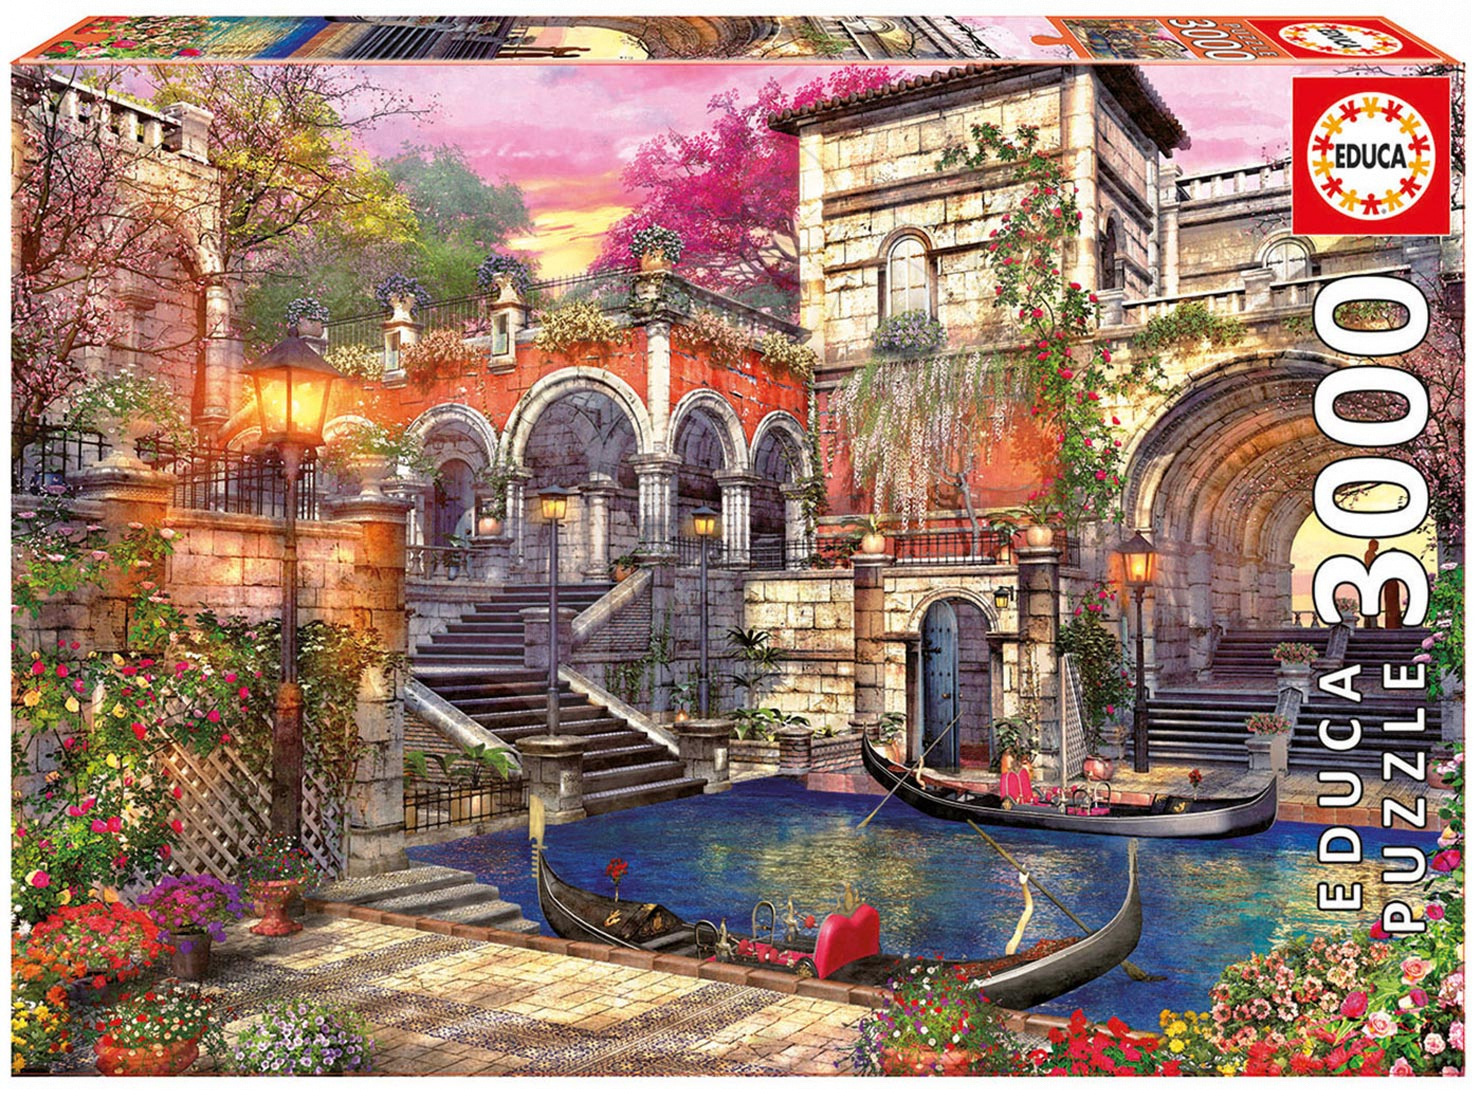 Puzzle 3000 dielne - Puzzle Genuine Venice Courtship Educa 3000 dielov od 15 rokov